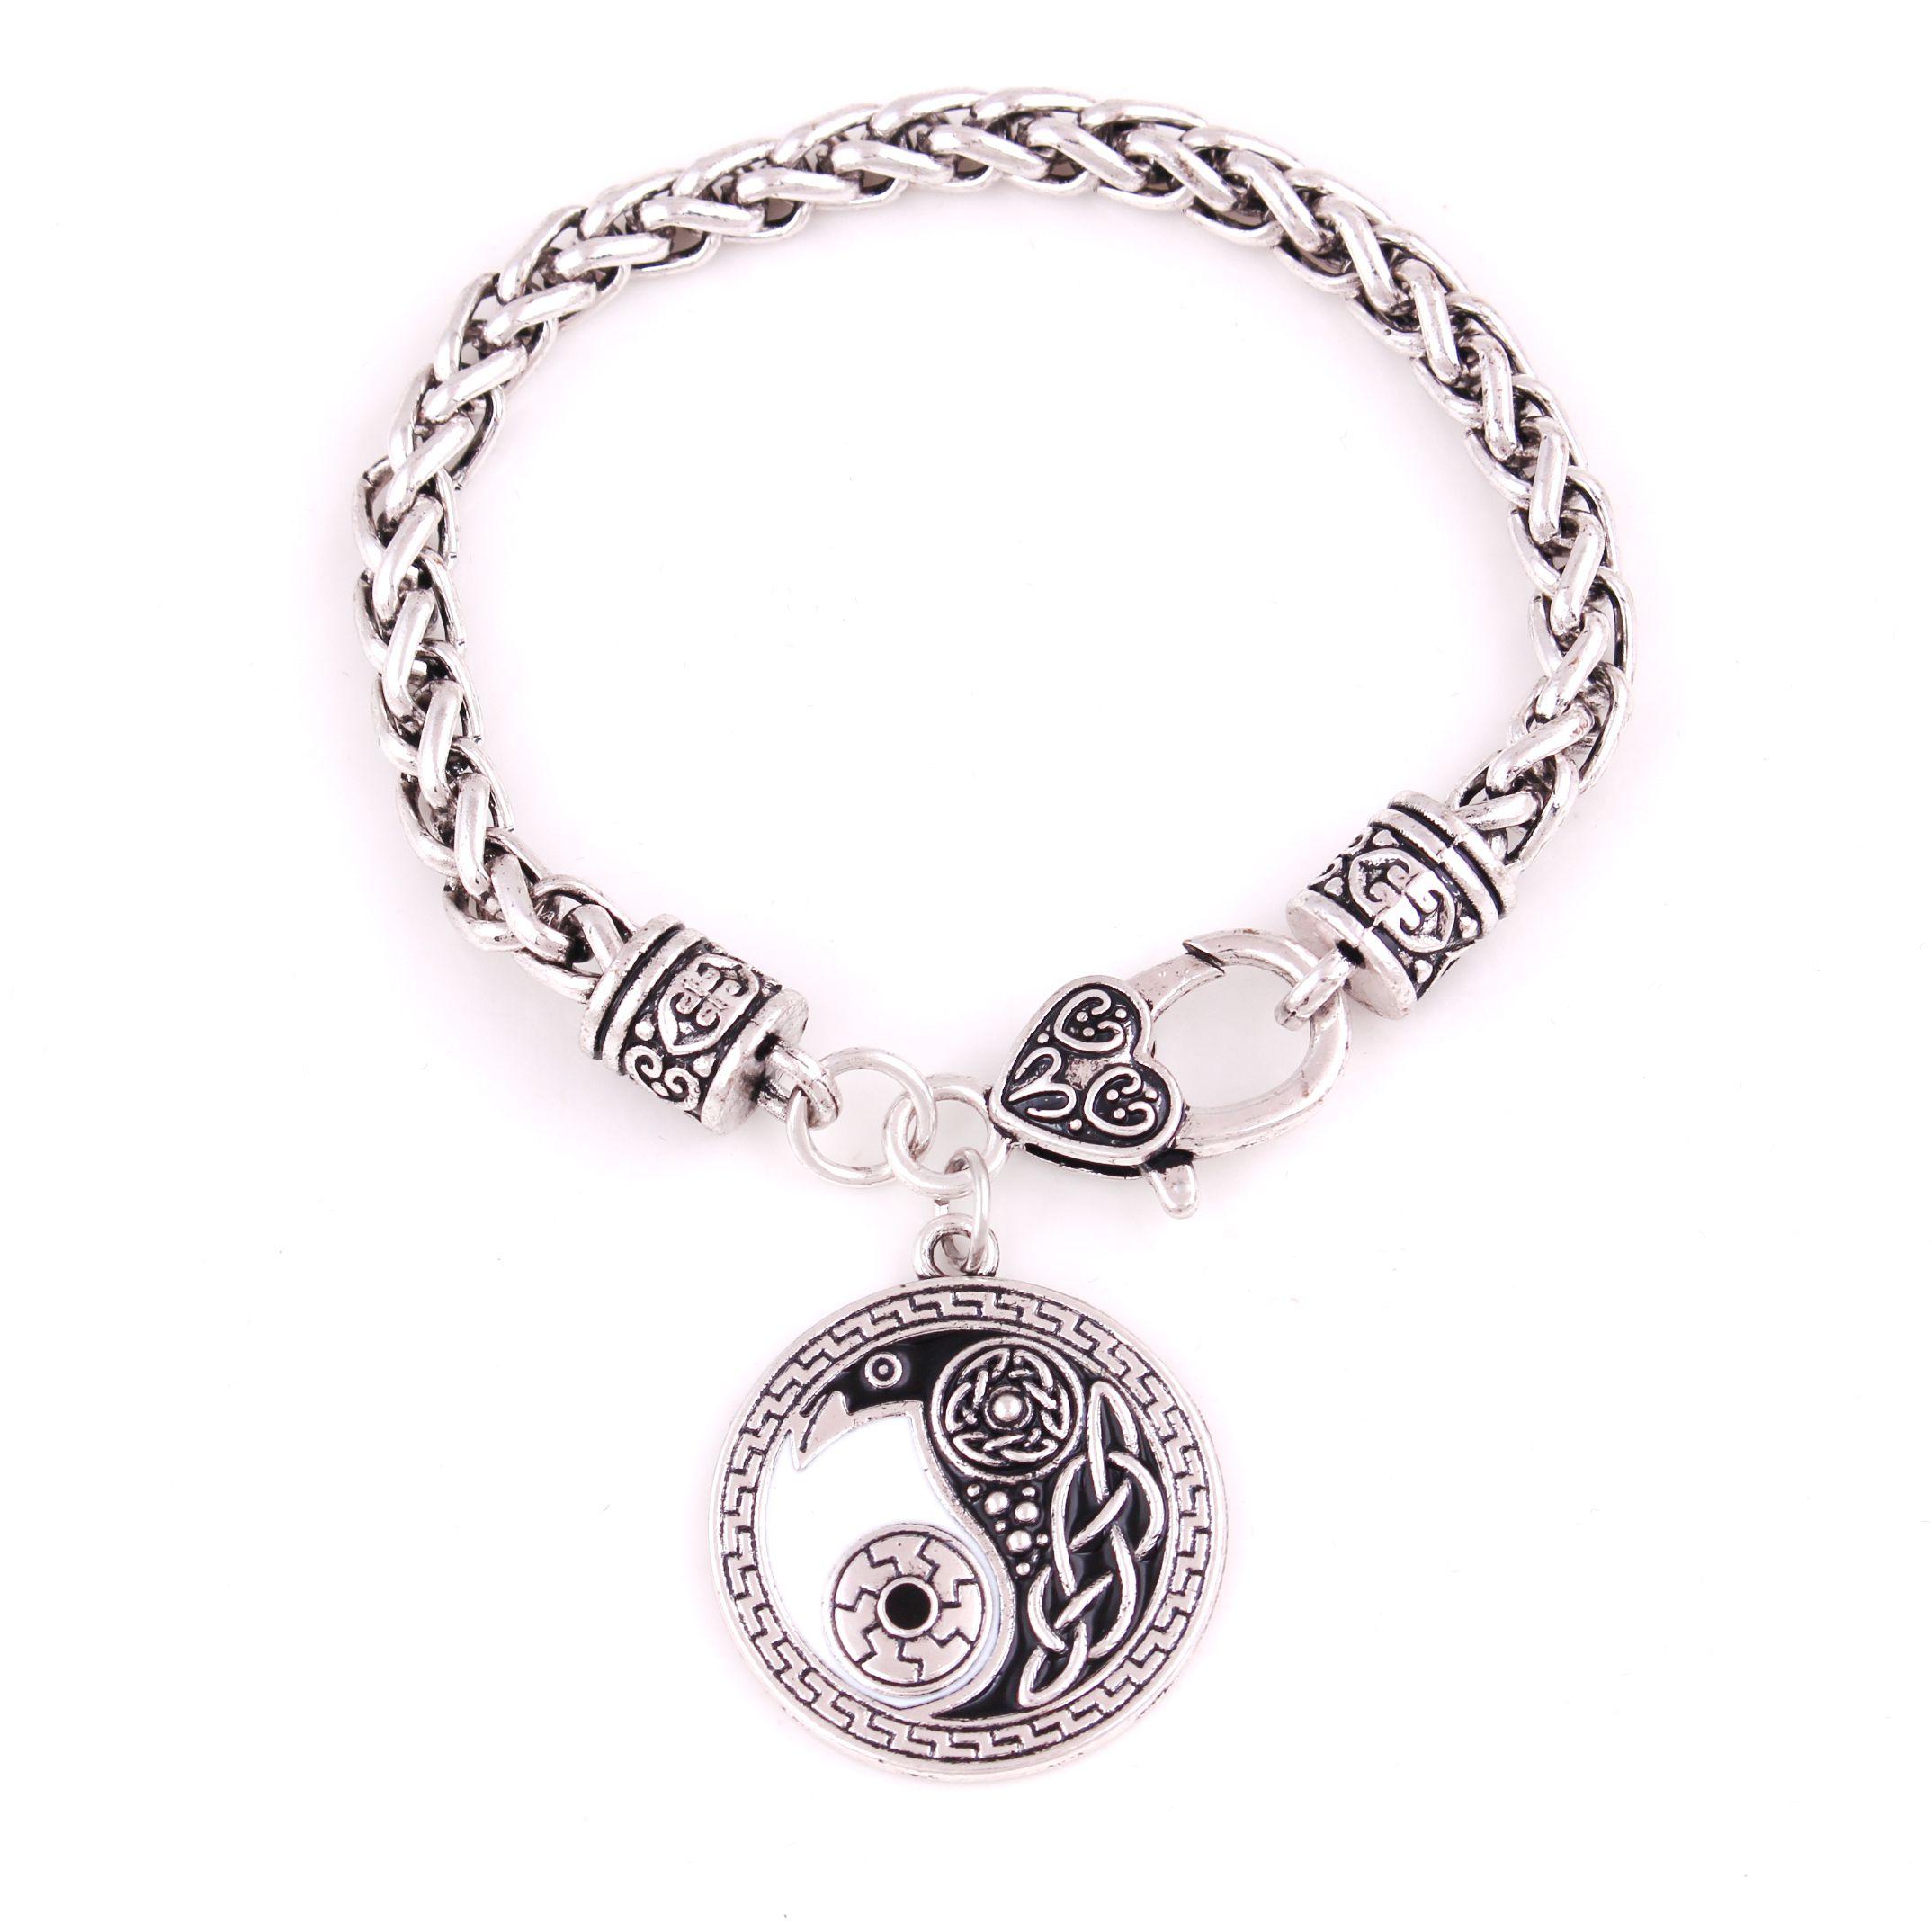 HY188 Religious amulet bracelet raven pendant and black enamel form a raven embedded of Yin Yang symbol